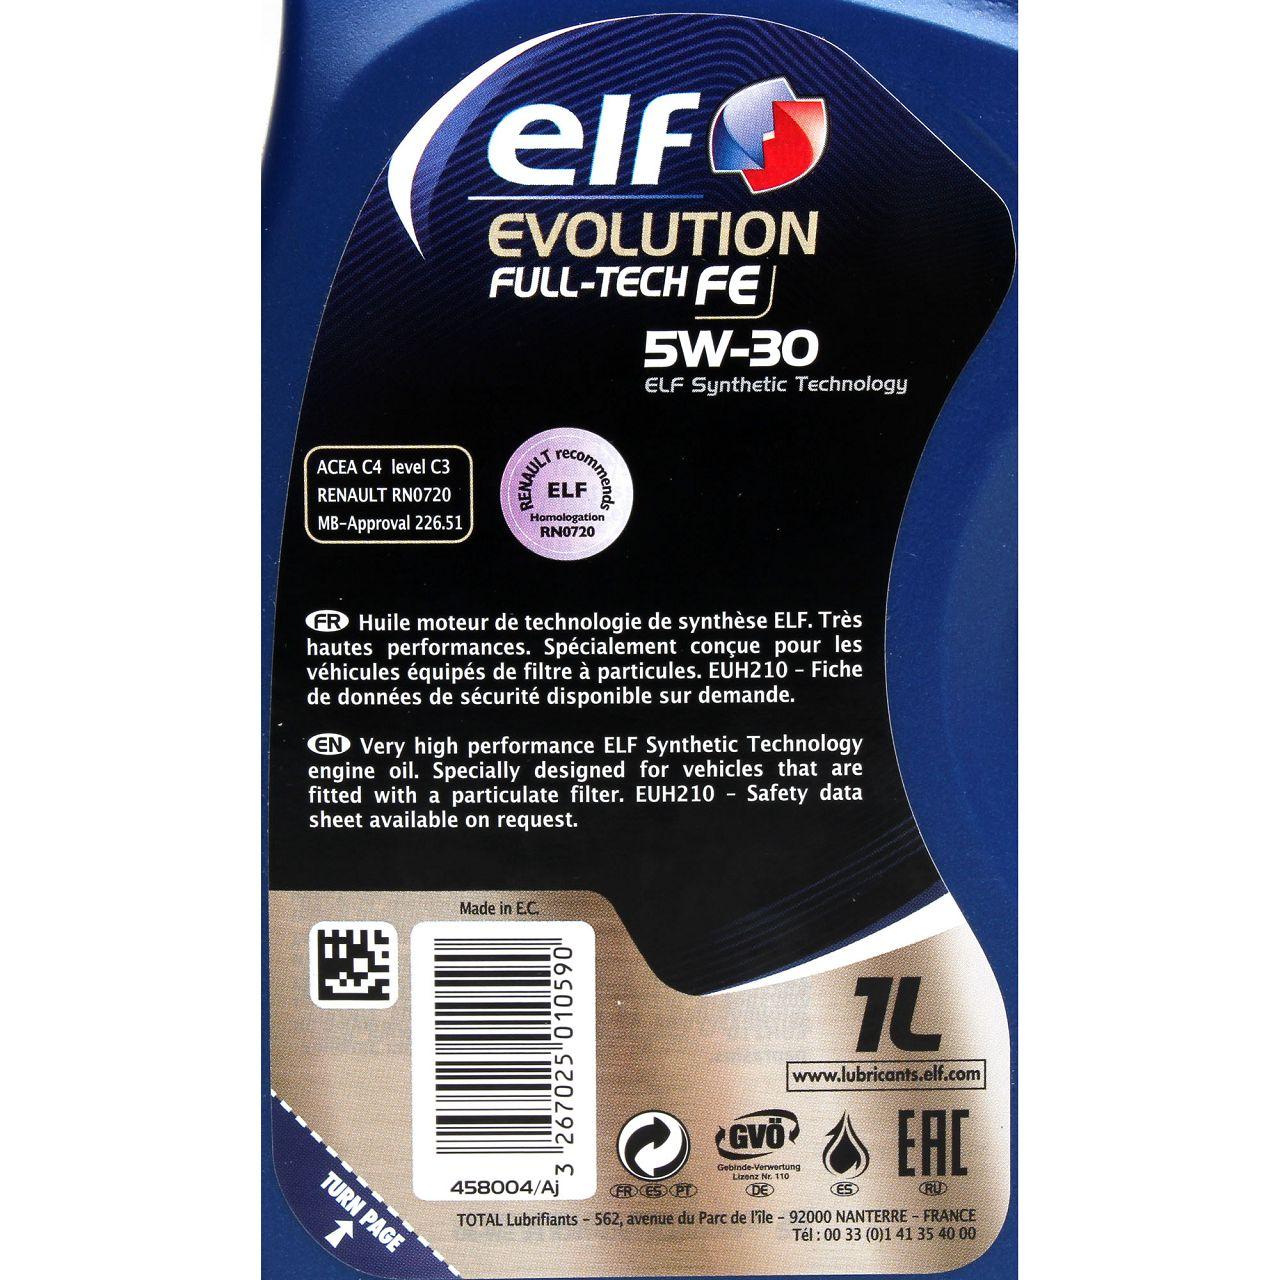 elf Evolution Full-Tech FE 5W-30 Motoröl RENAULT RN0720 MB 226.51 - 1L 1 Liter